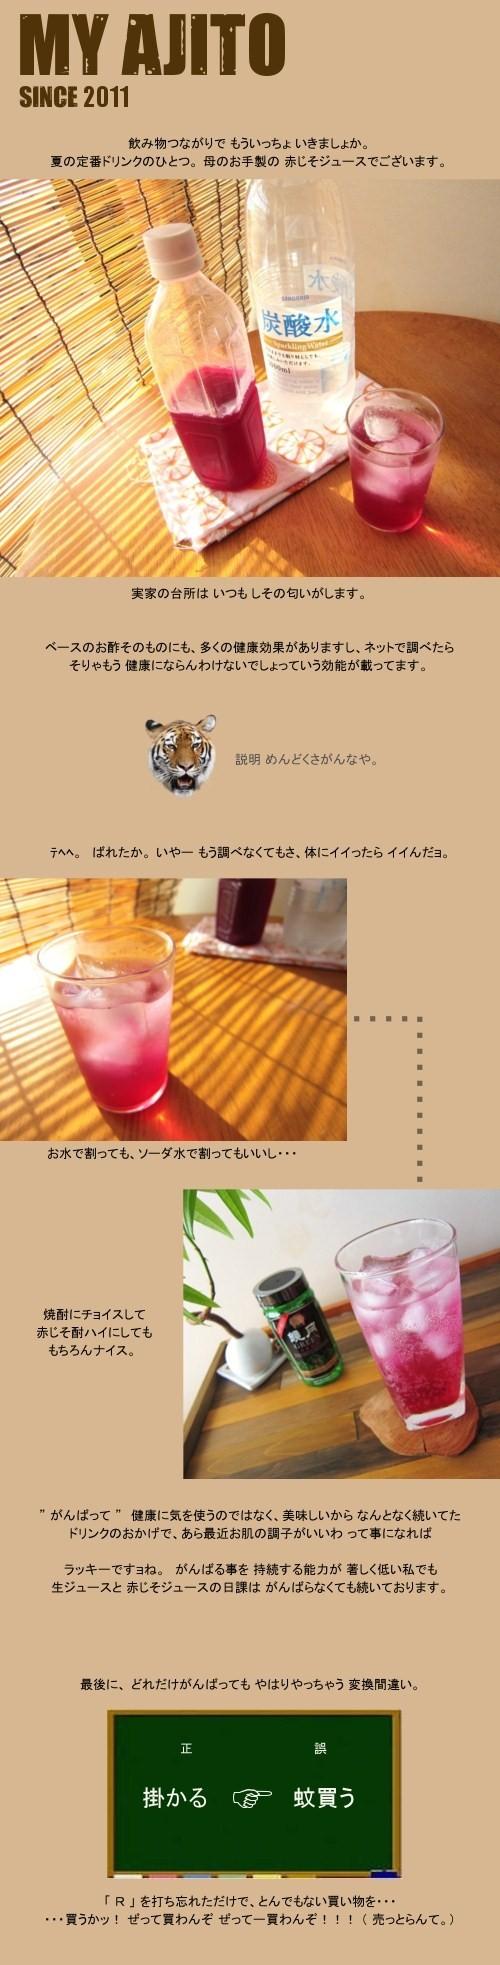 namaju_05.jpg